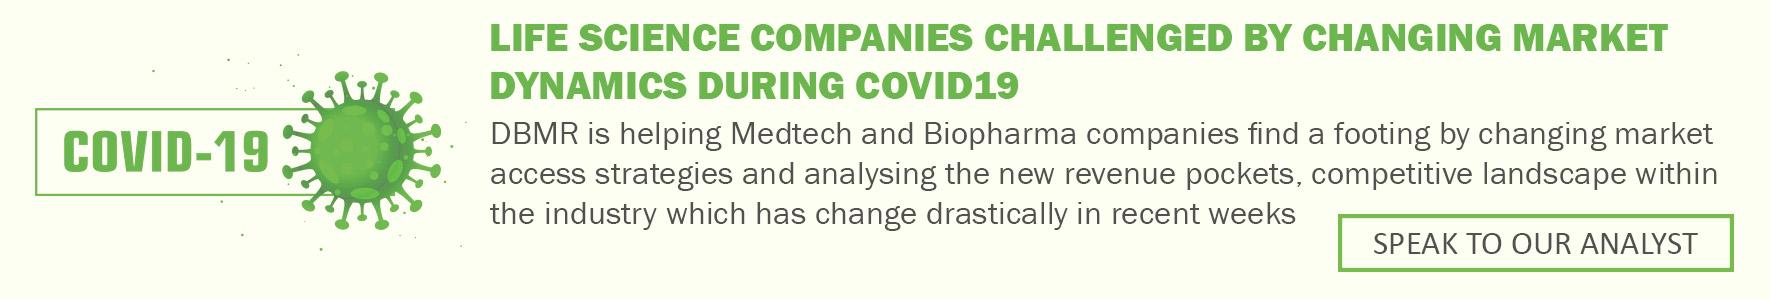 Photoacoustic Imaging Market 2020-2027 Is Set To Experience Revolutionary Growth    Leading Players – Hitachi Medical Corporation, illumiSonics Inc., InnoLas Laser GmbH, PA Imaging R&D BV, Seno Medical Instruments thumbnail